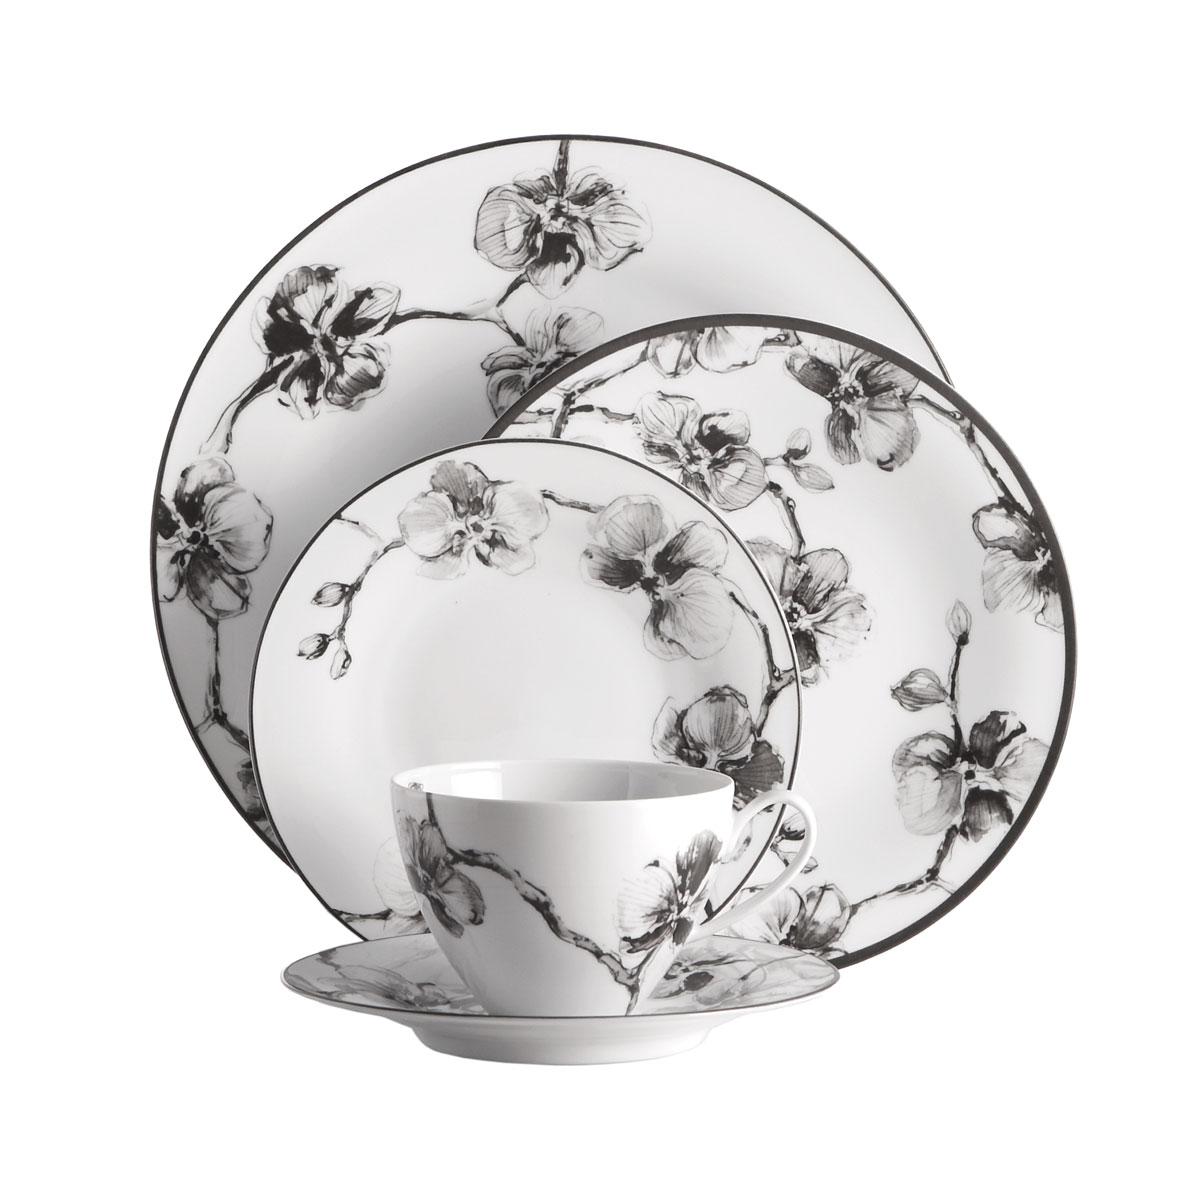 Michael Aram China Black Orchid 5pc Setting